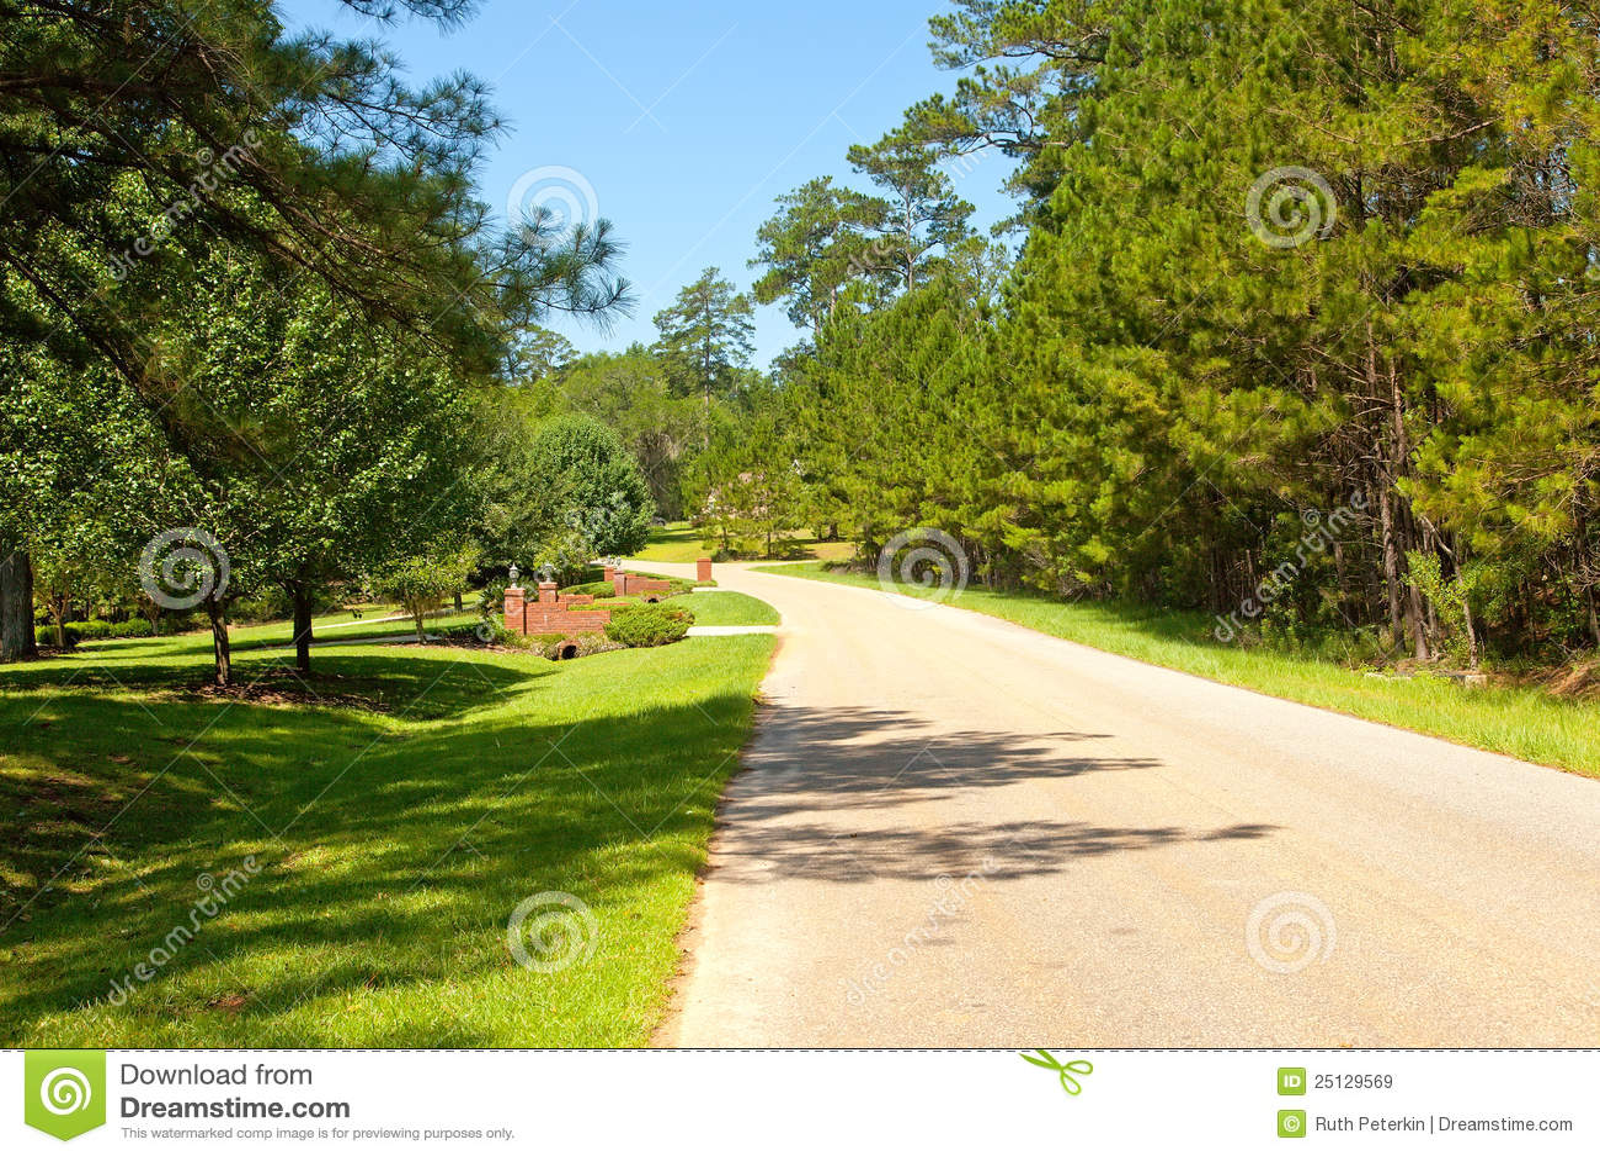 Street in Rural Community stock image. Image of ...